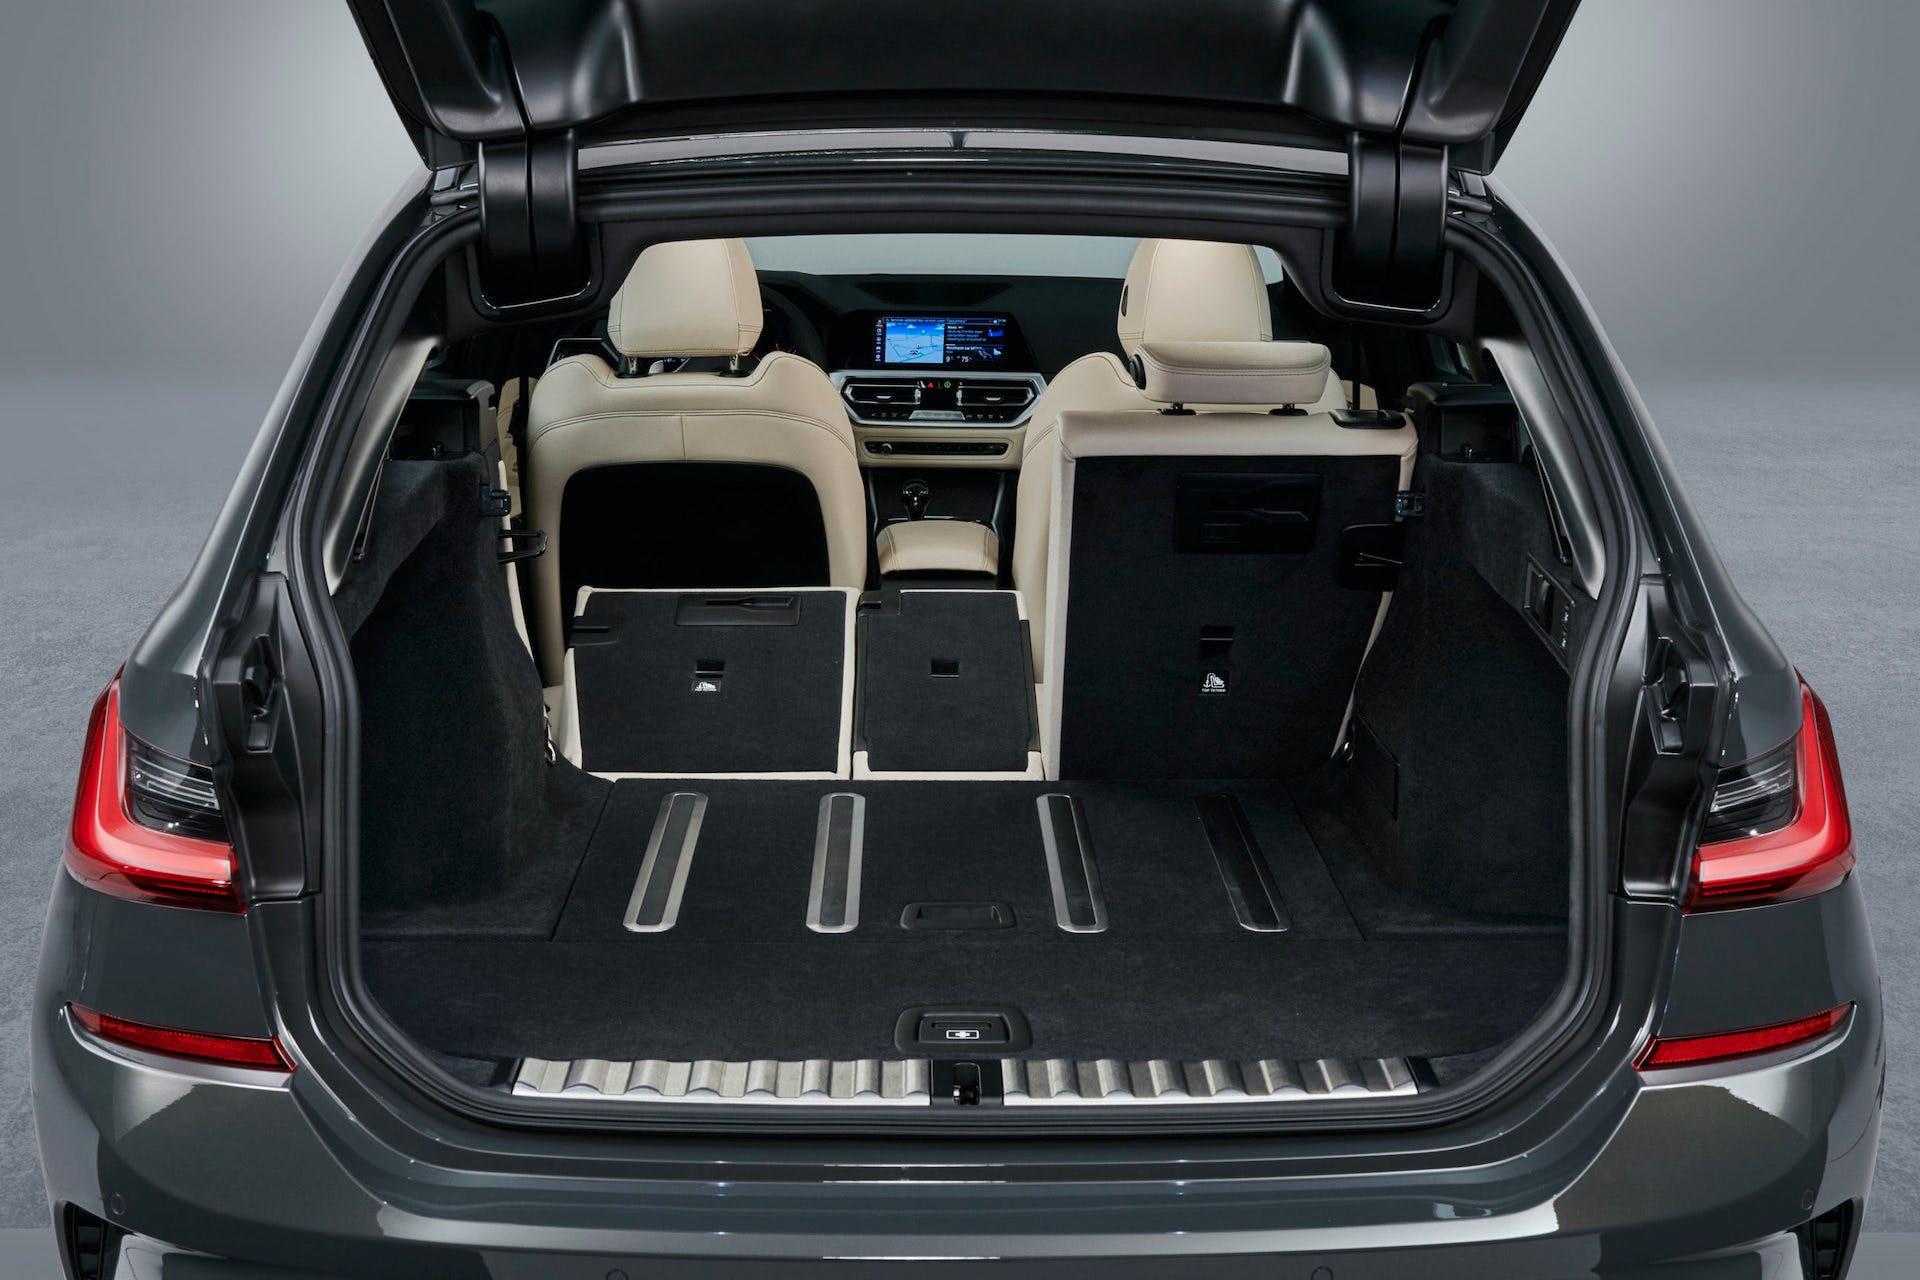 BMW_Serie 3_Touring_sedili abbattuti